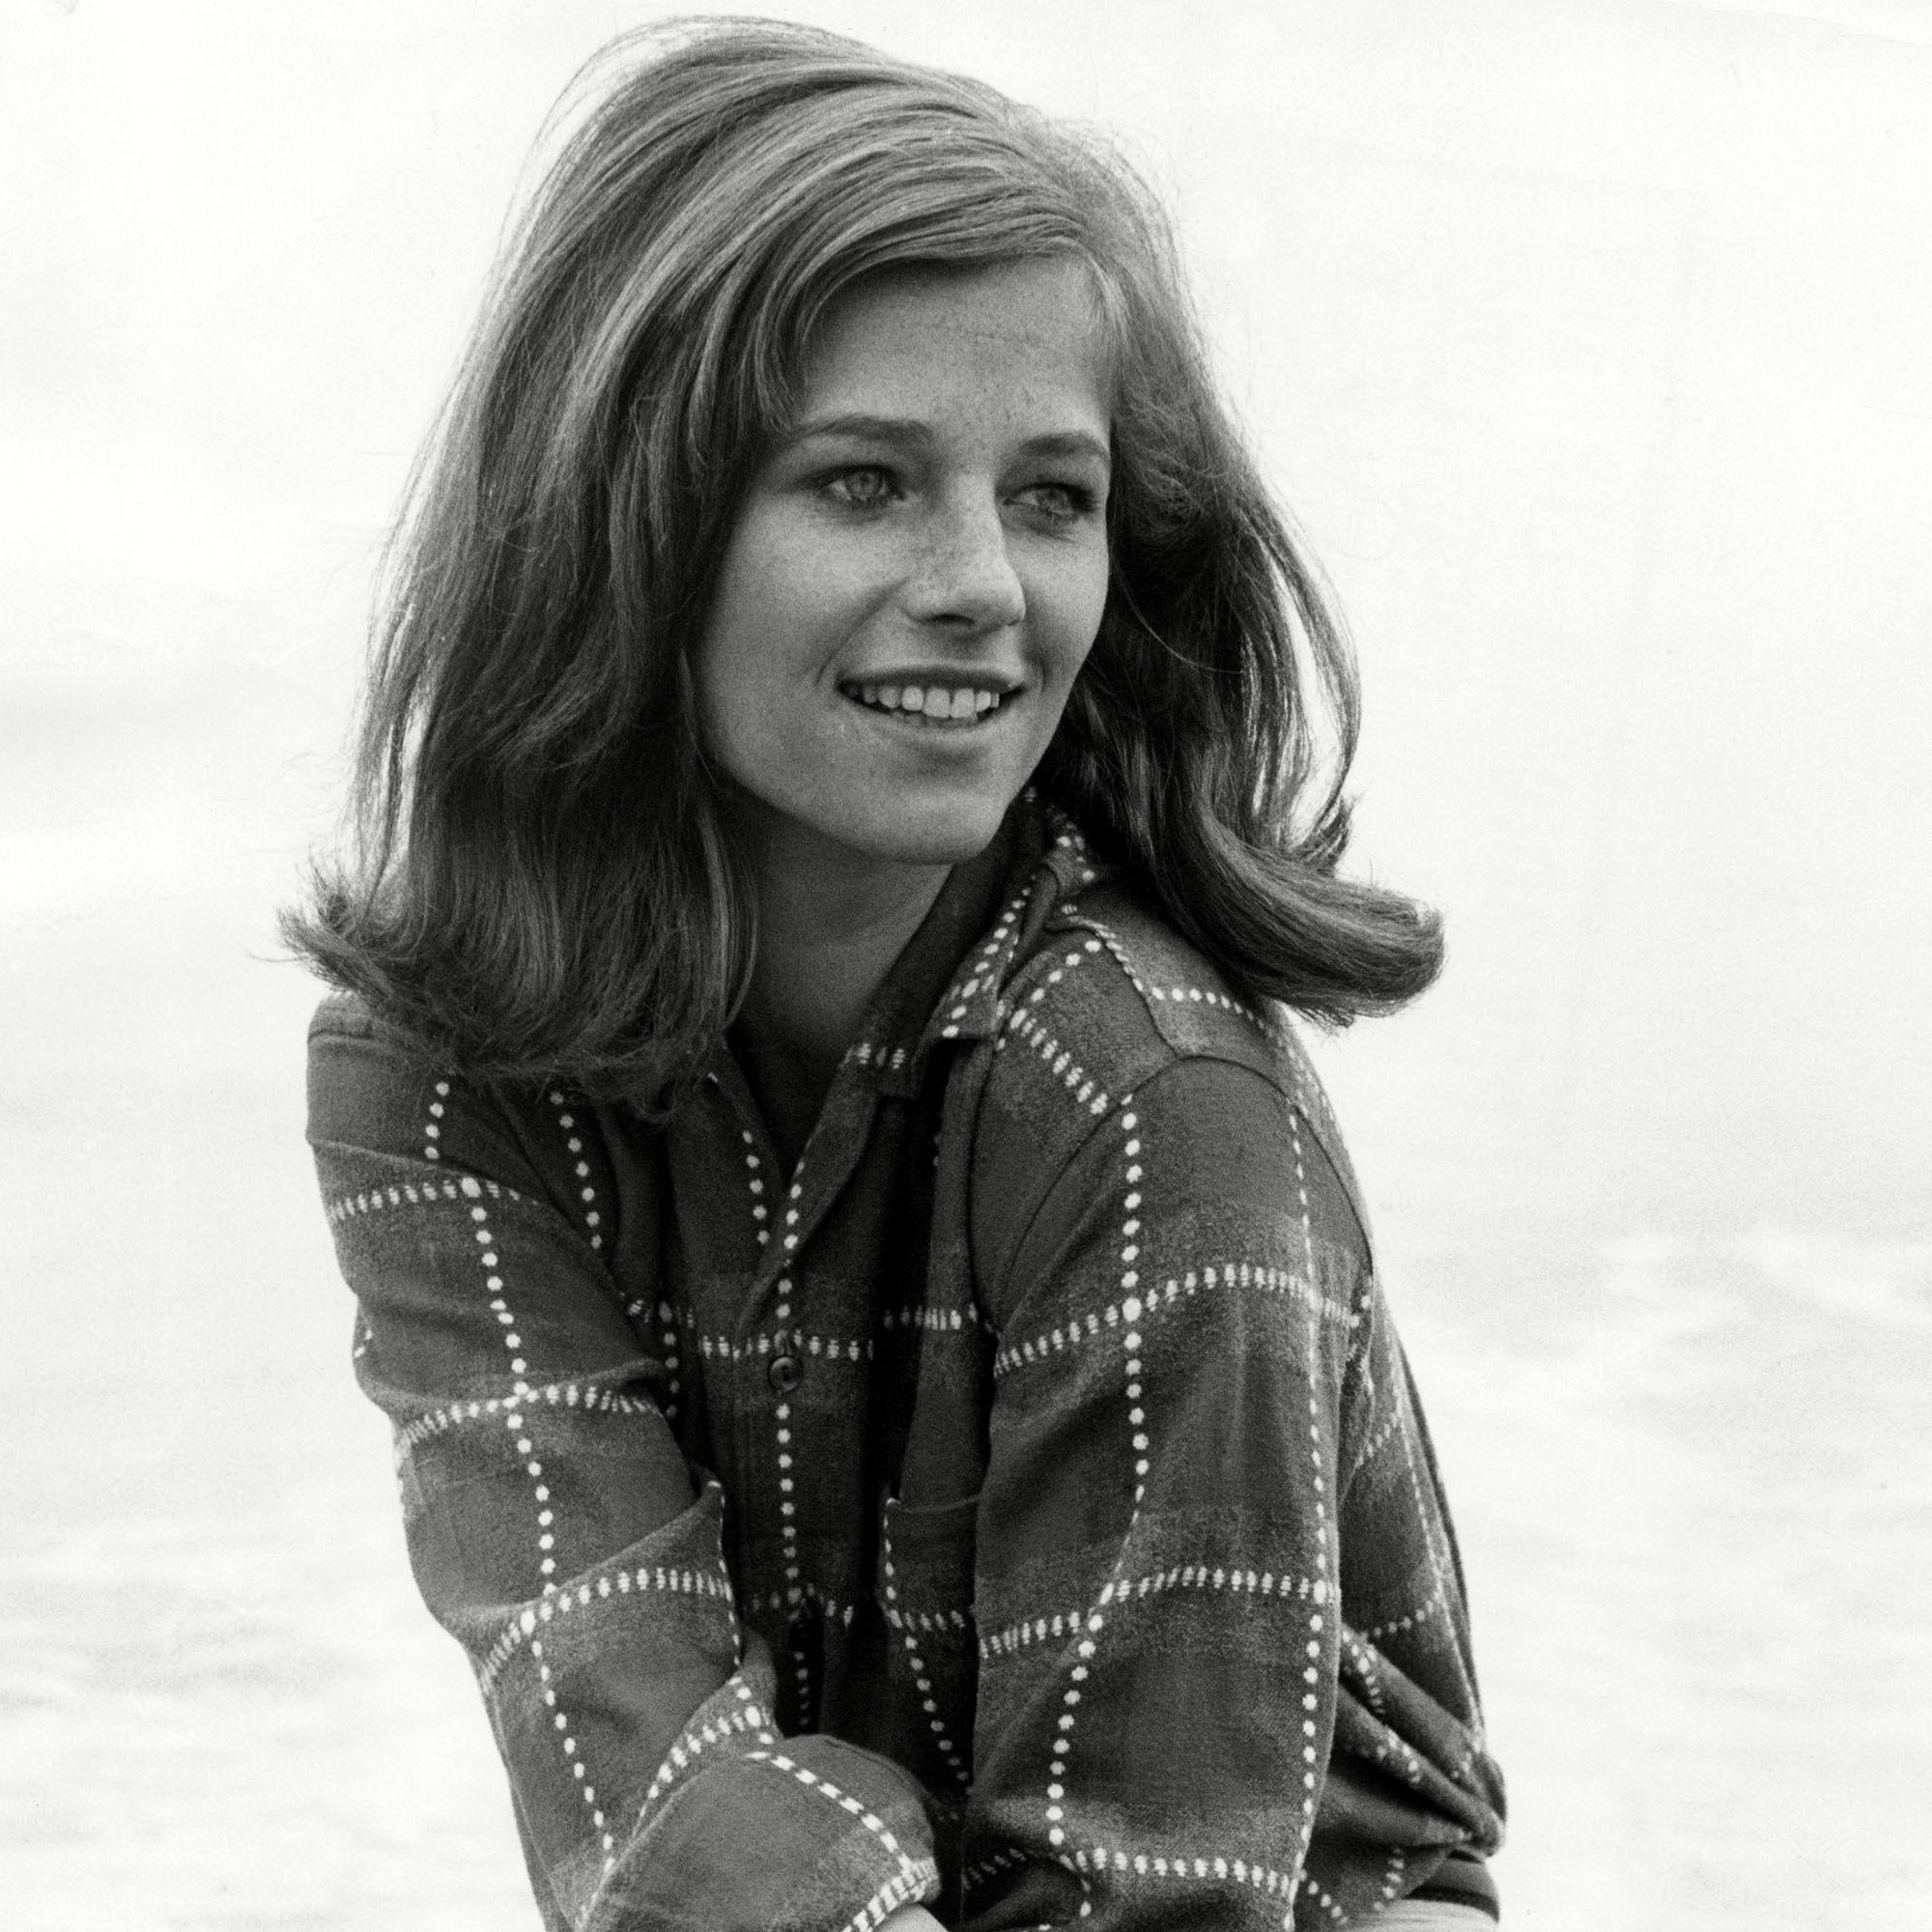 Mandatory Credit: Photo by REX USA (2250773a)&#xA&#x3B;ROTTEN TO THE CORE, Charlotte Rampling, 1965&#xA&#x3B;ROTTEN TO THE CORE, Charlotte Rampling, 1965&#xA&#x3B;&#xA&#x3B;